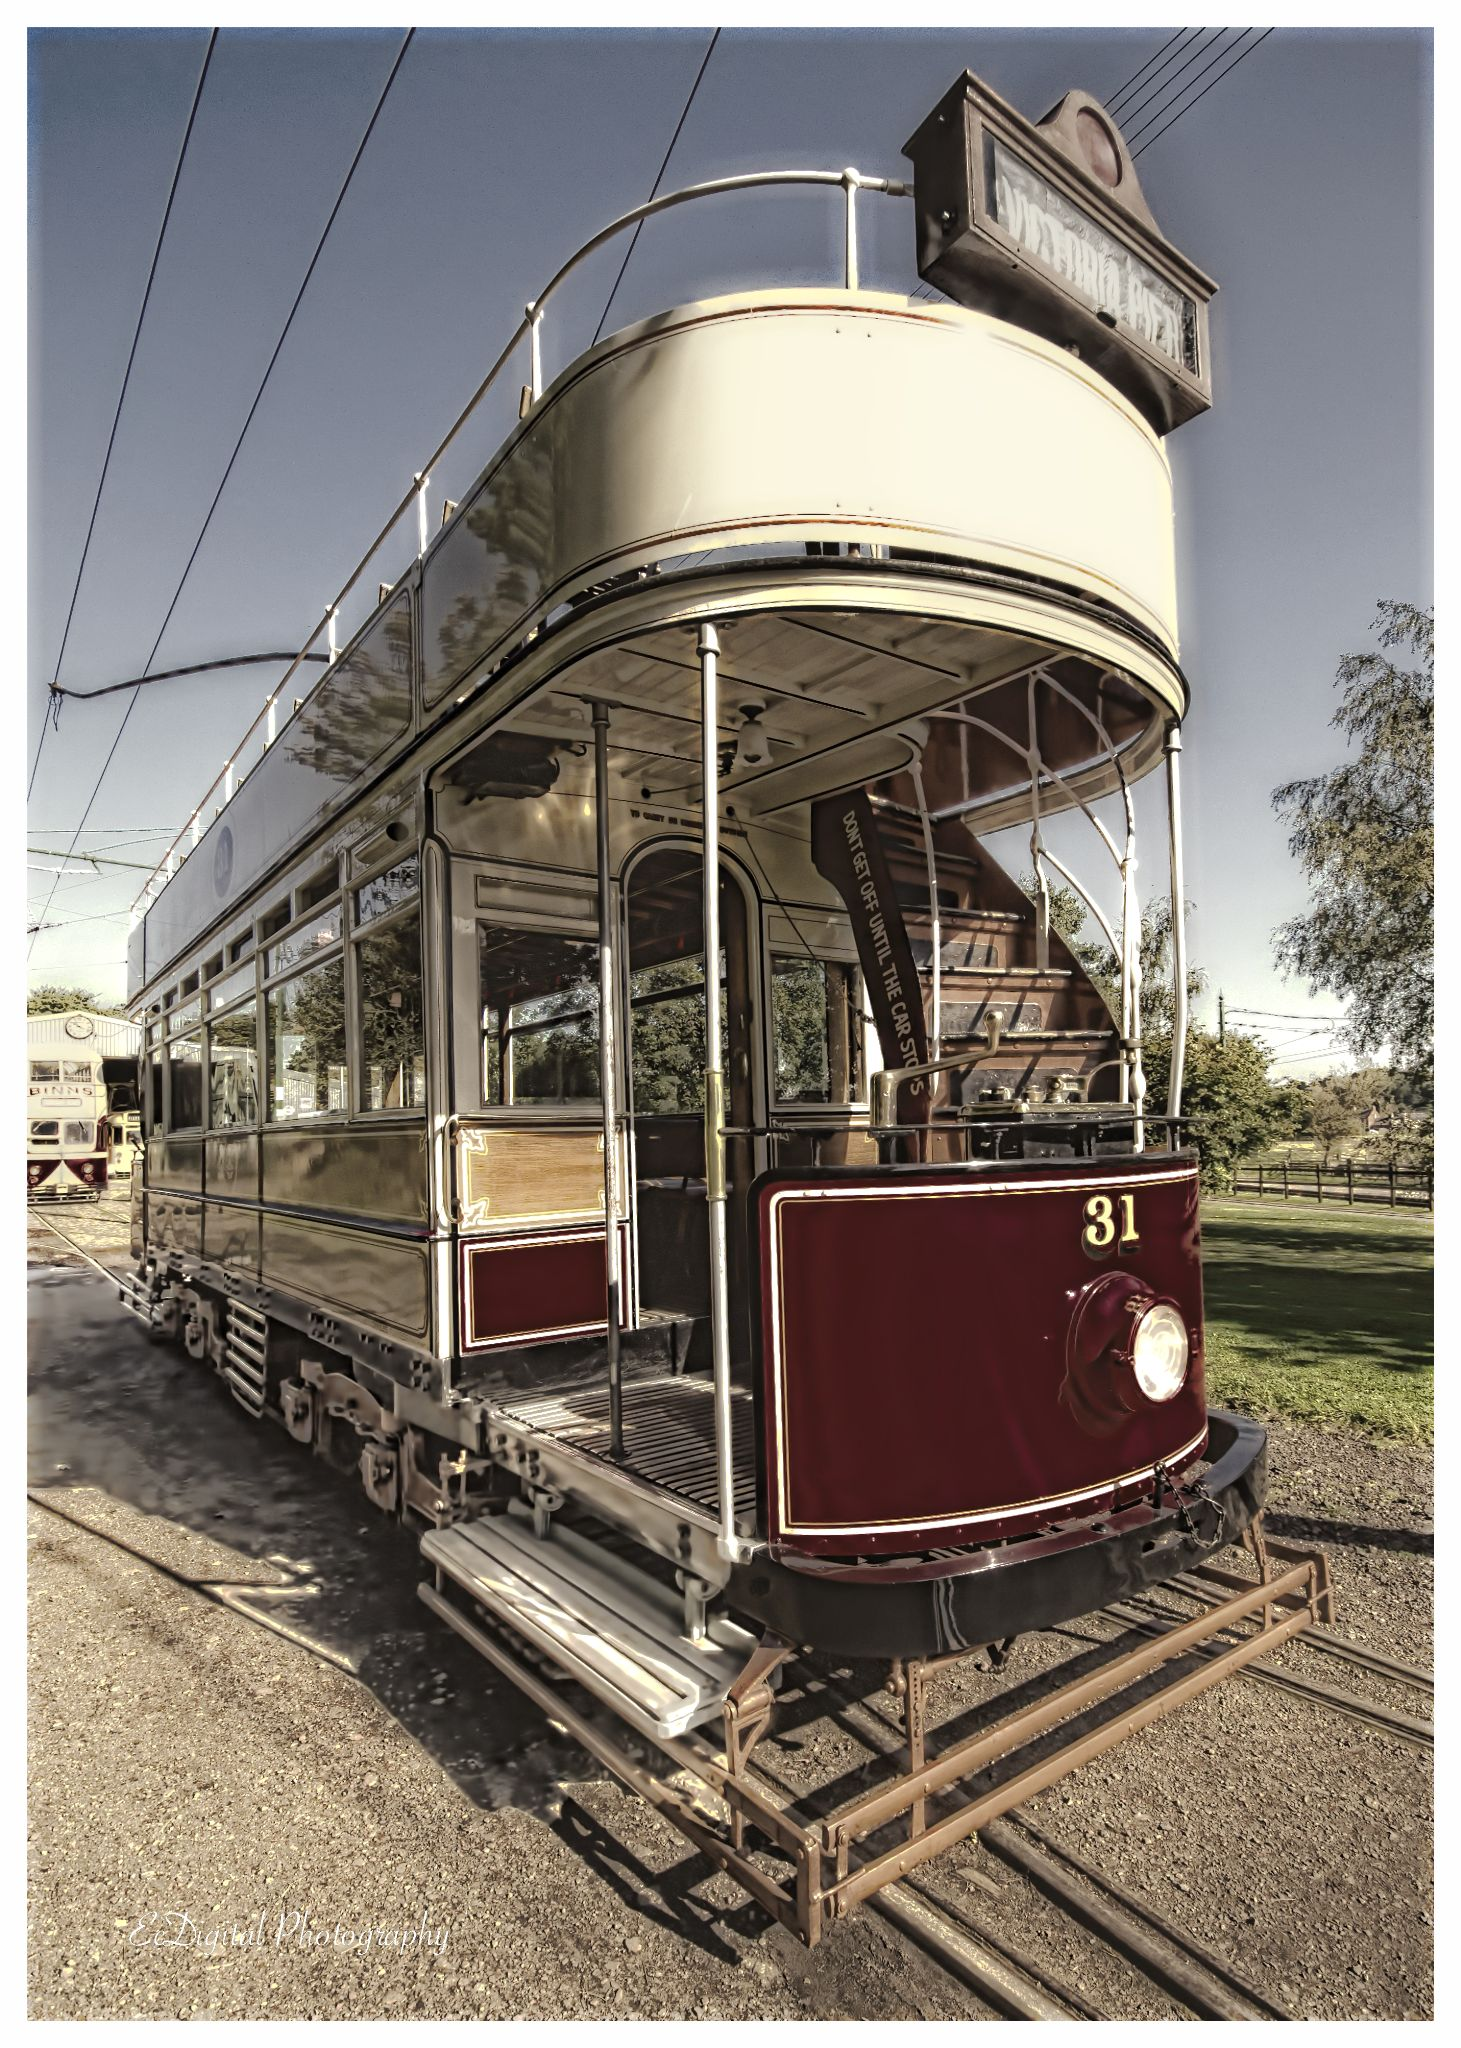 Tram by EcDigital Photography